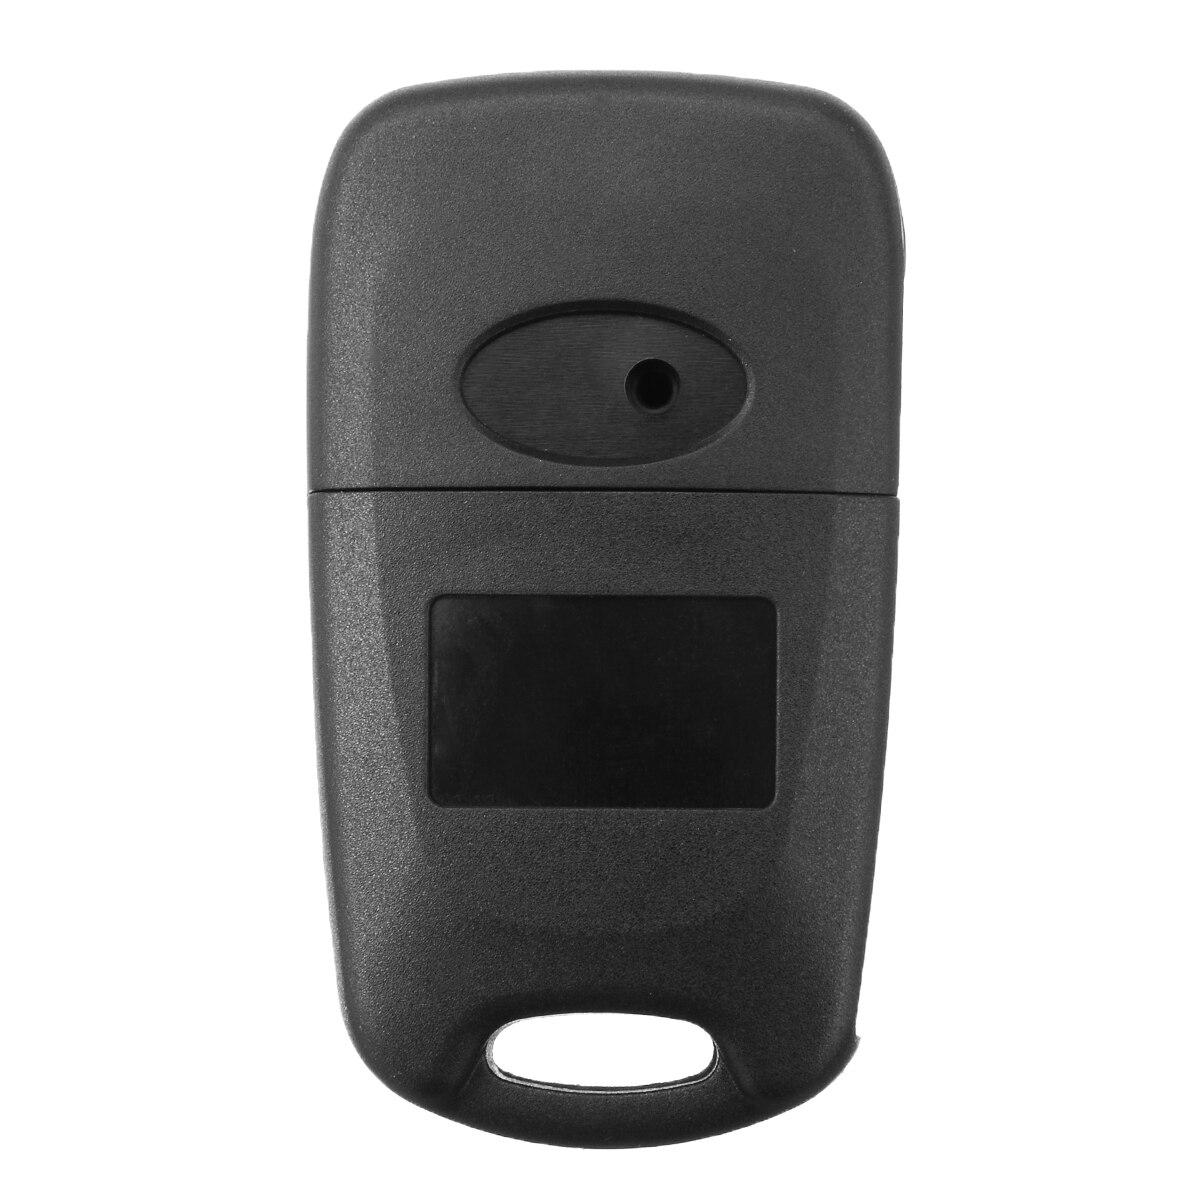 3 Button Car Key Cover Case Remote Key Fob Case Shell Accessories For Kia Ceed Picanto Sportage For Hyundai i20 i30 ix35 5